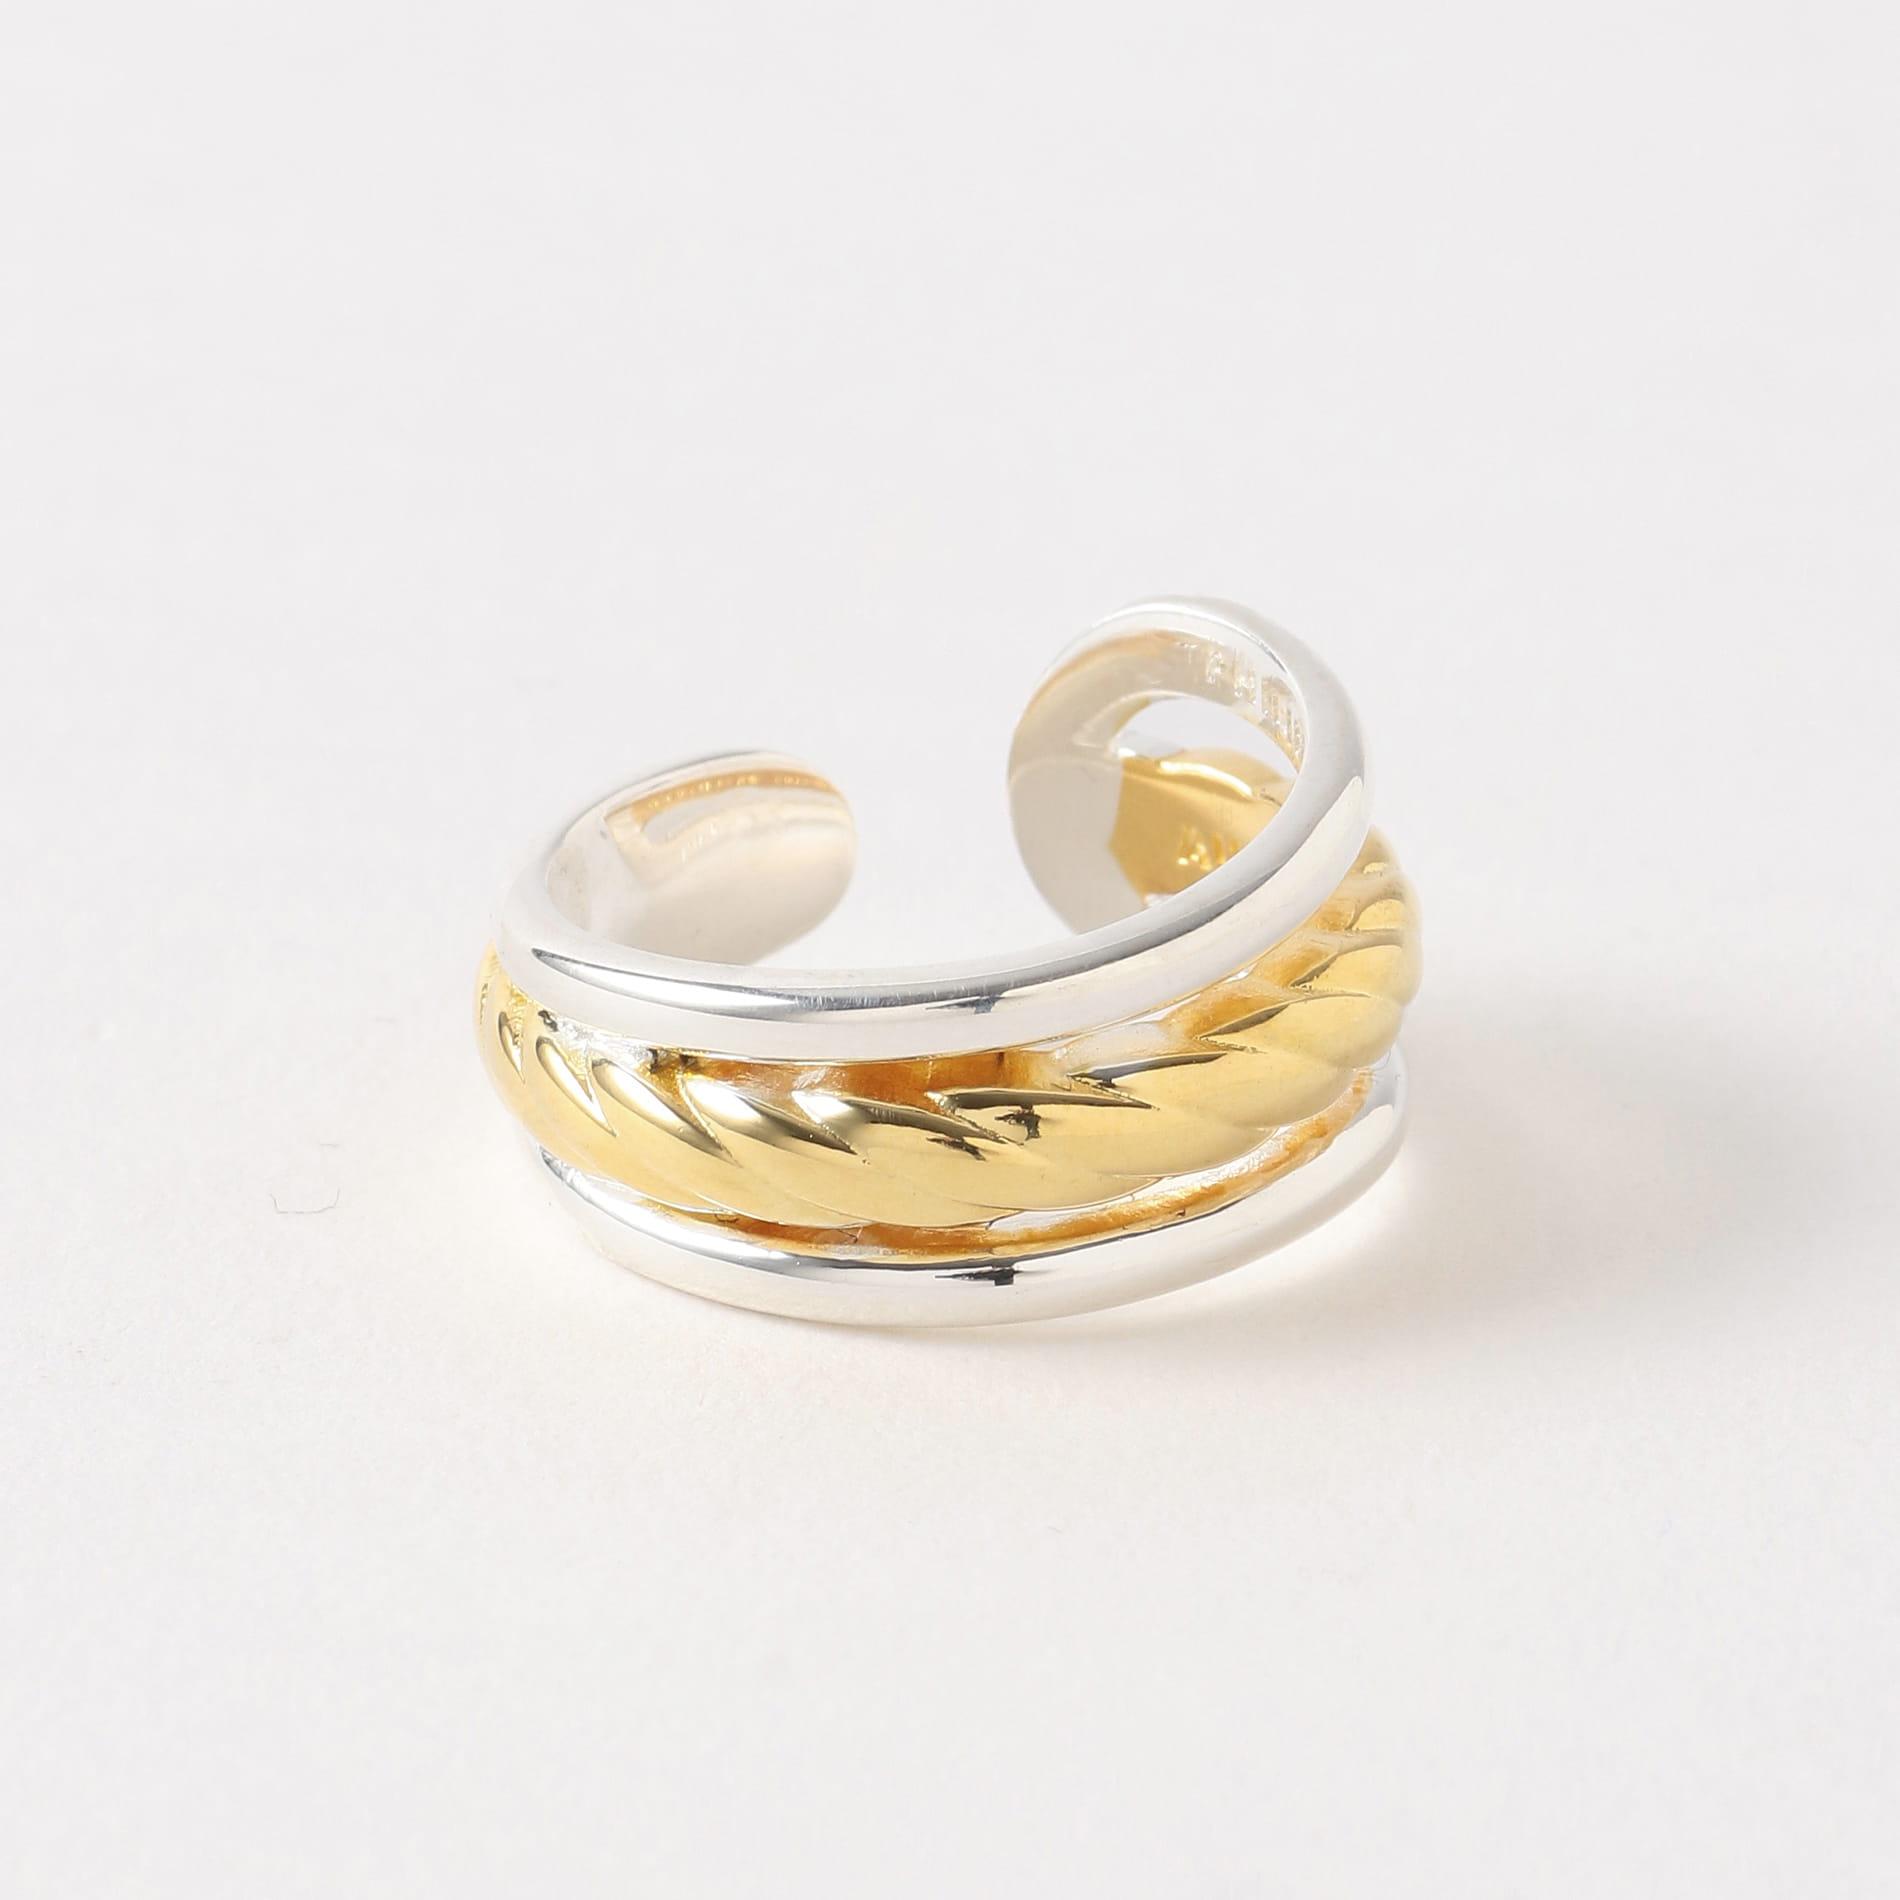 【PHILIPPE AUDIBERT】WOMEN リング inola ring brass Bicolor silver/gold BG4669